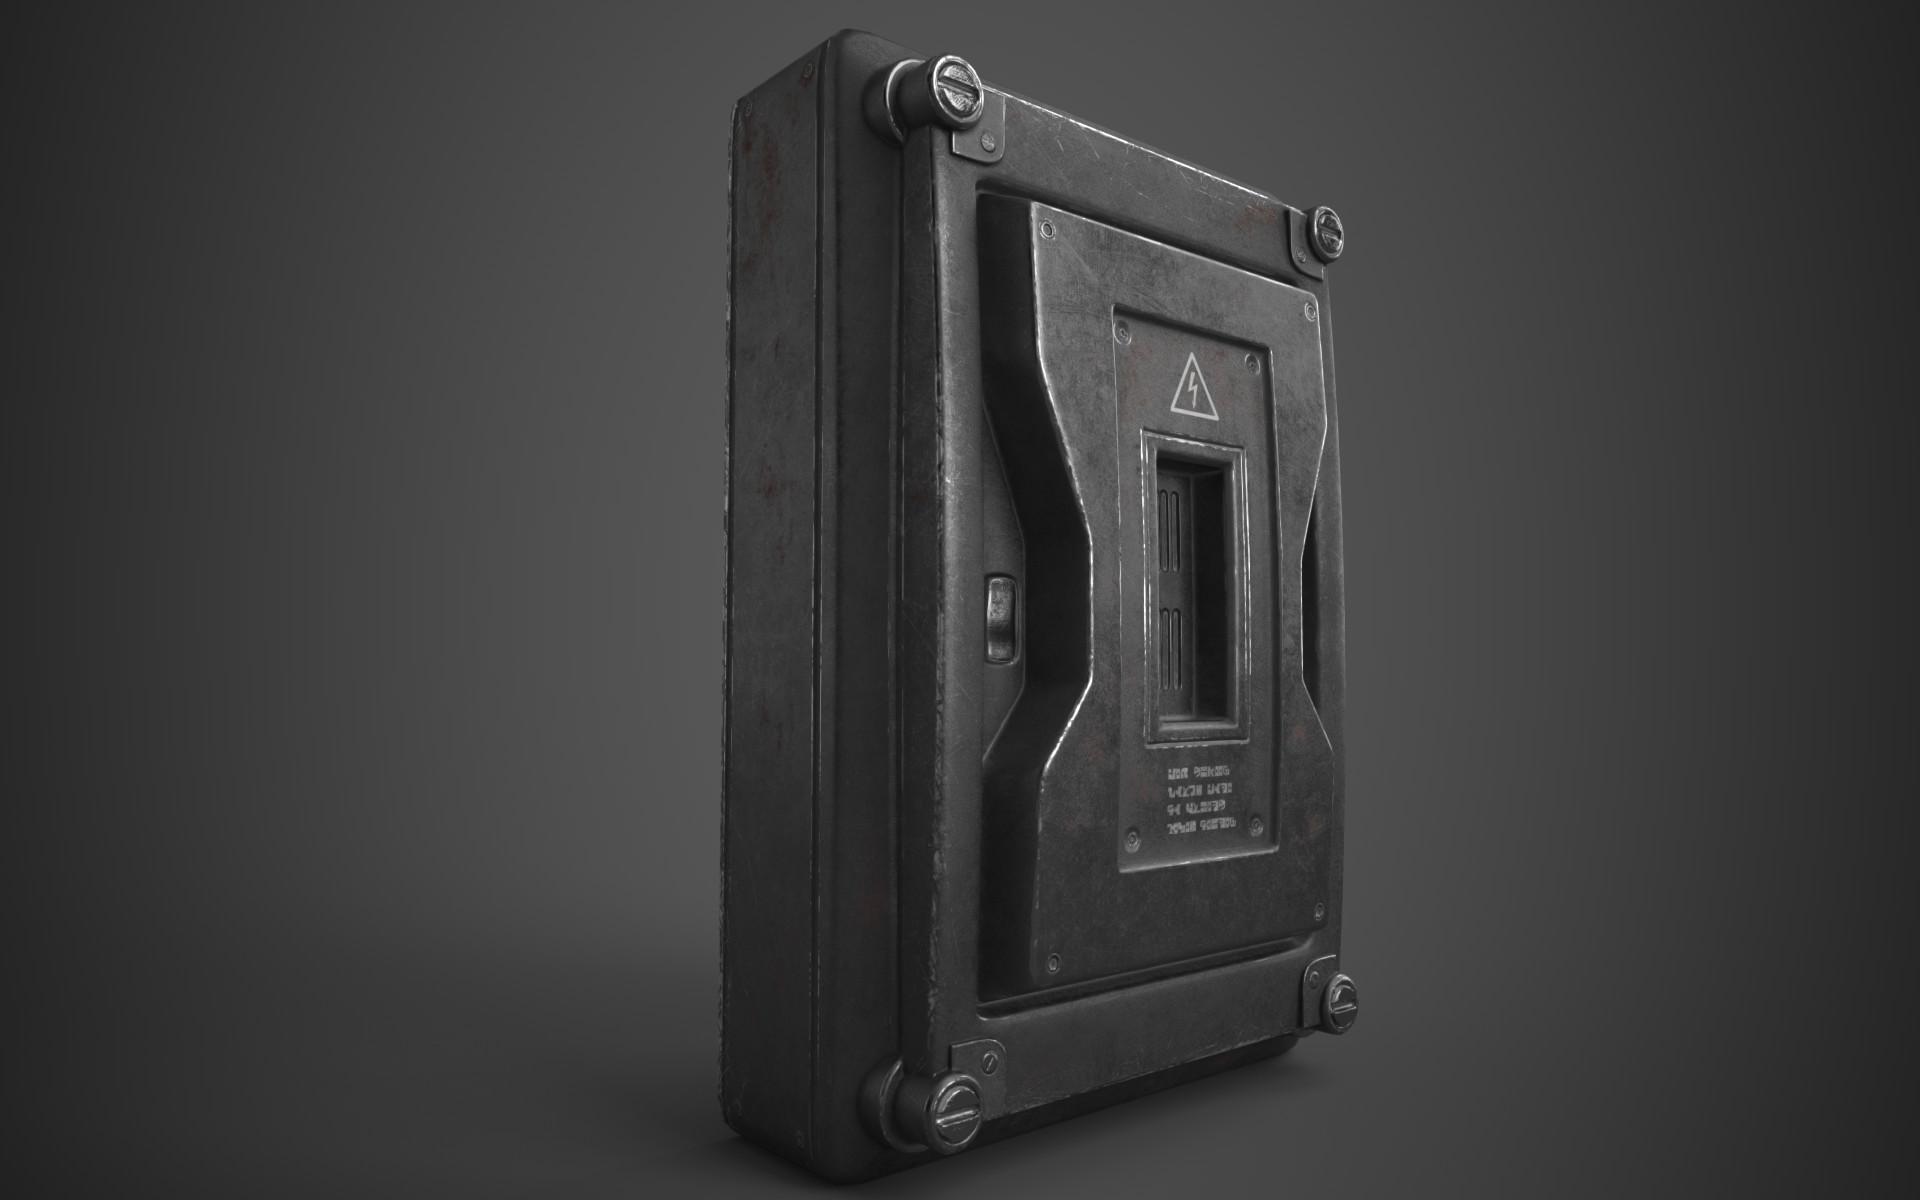 jonas meyer some propsjonas meyer fuse box [ 1920 x 1200 Pixel ]